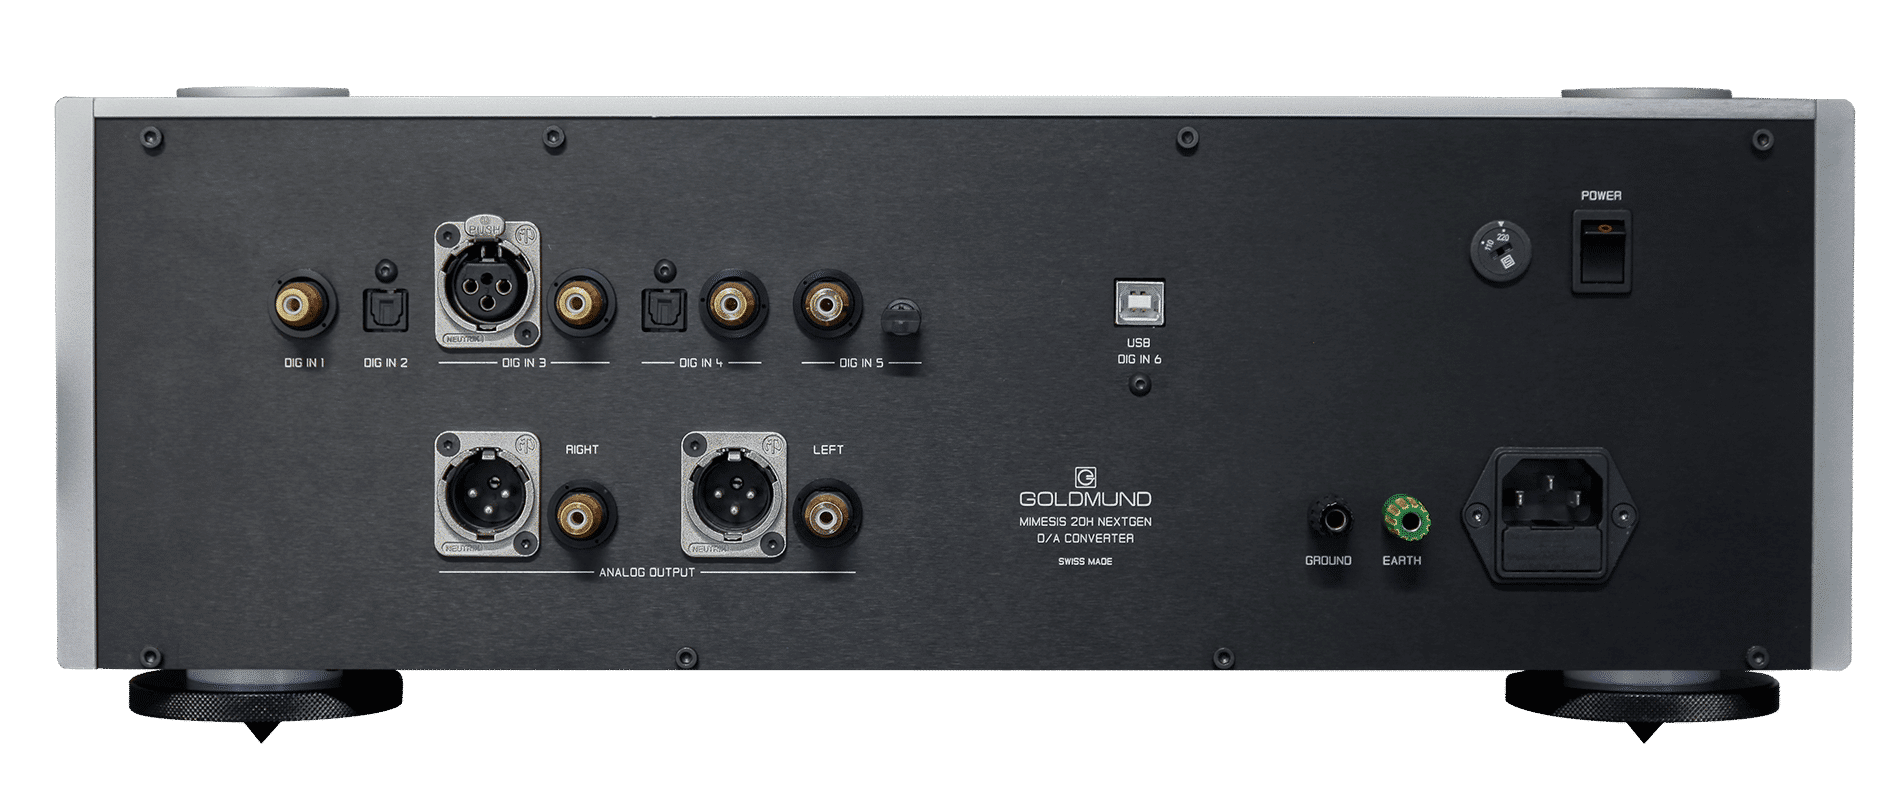 Mimesis 20H nextgen digital to analog converter rear connections